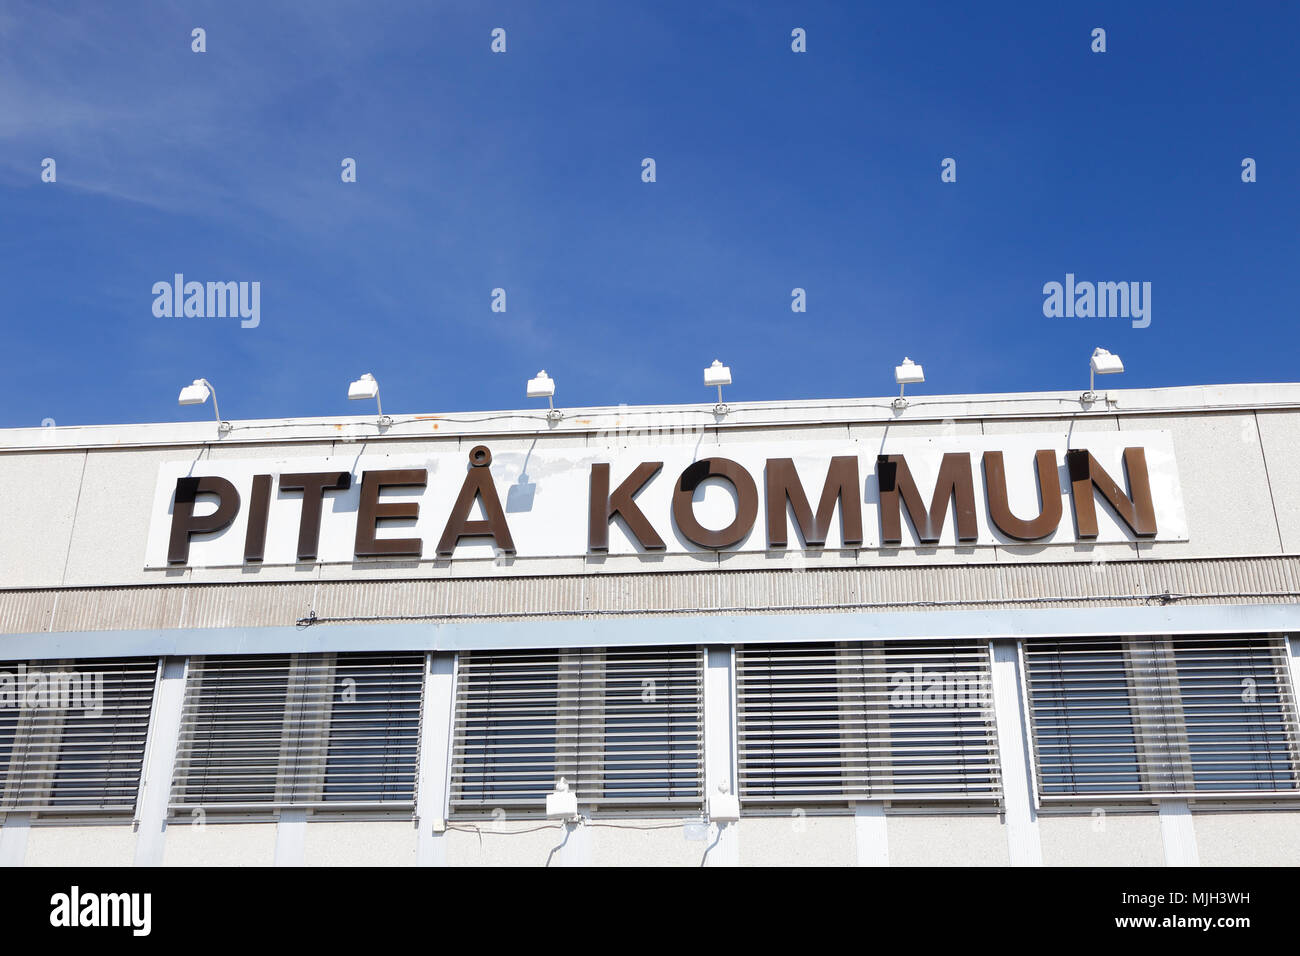 Pitea family help please - Message Boards